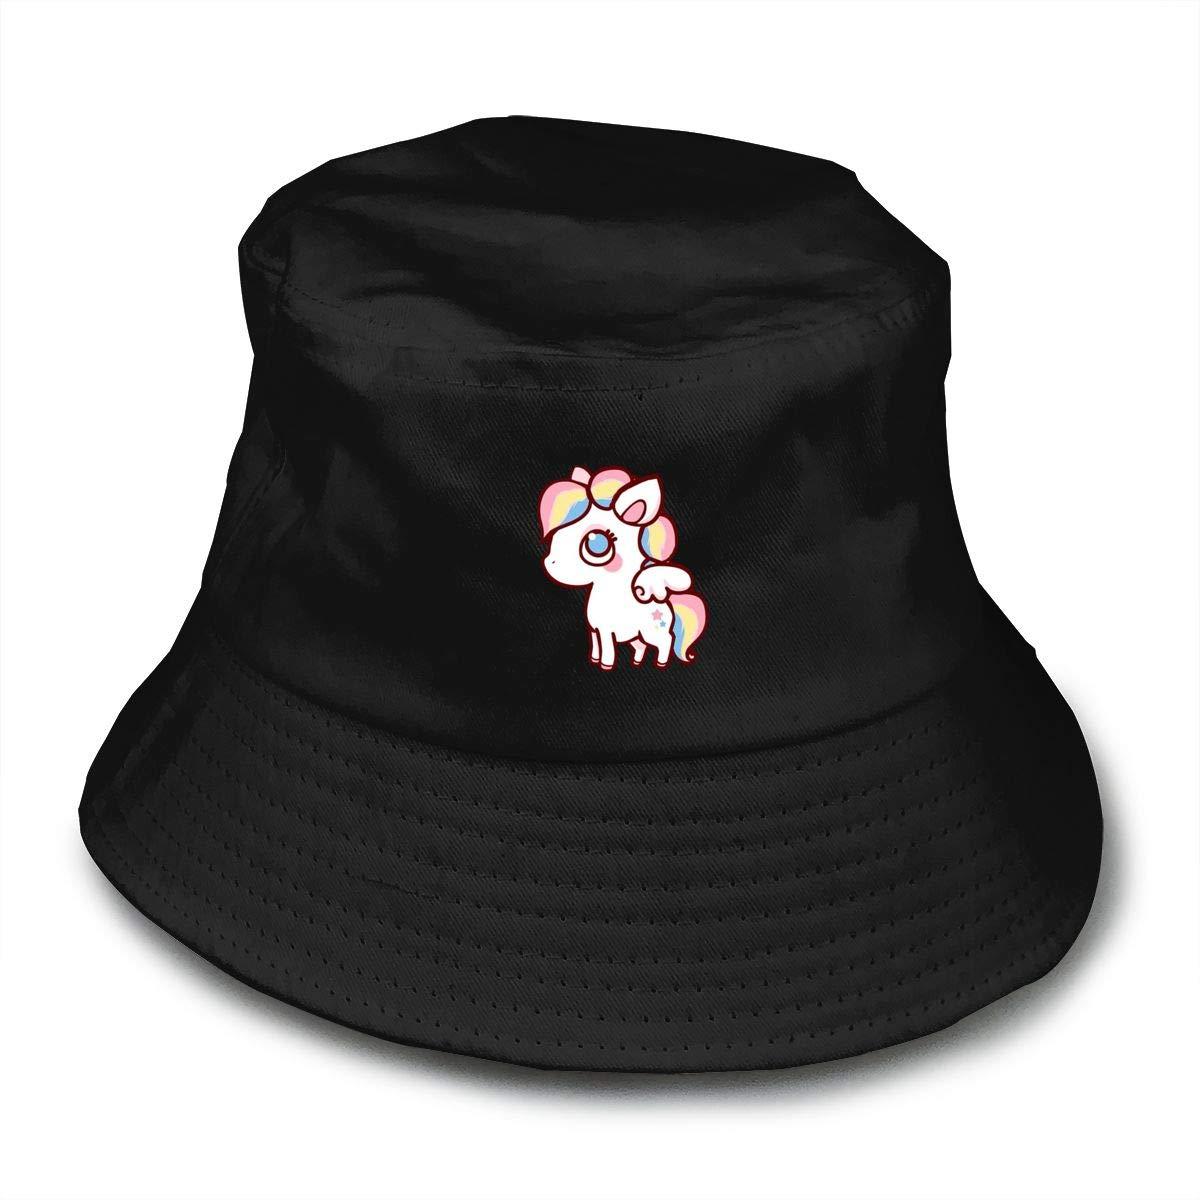 Unicorn Unisex Cotton Packable Pink Travel Bucket Hat Fishing Cap